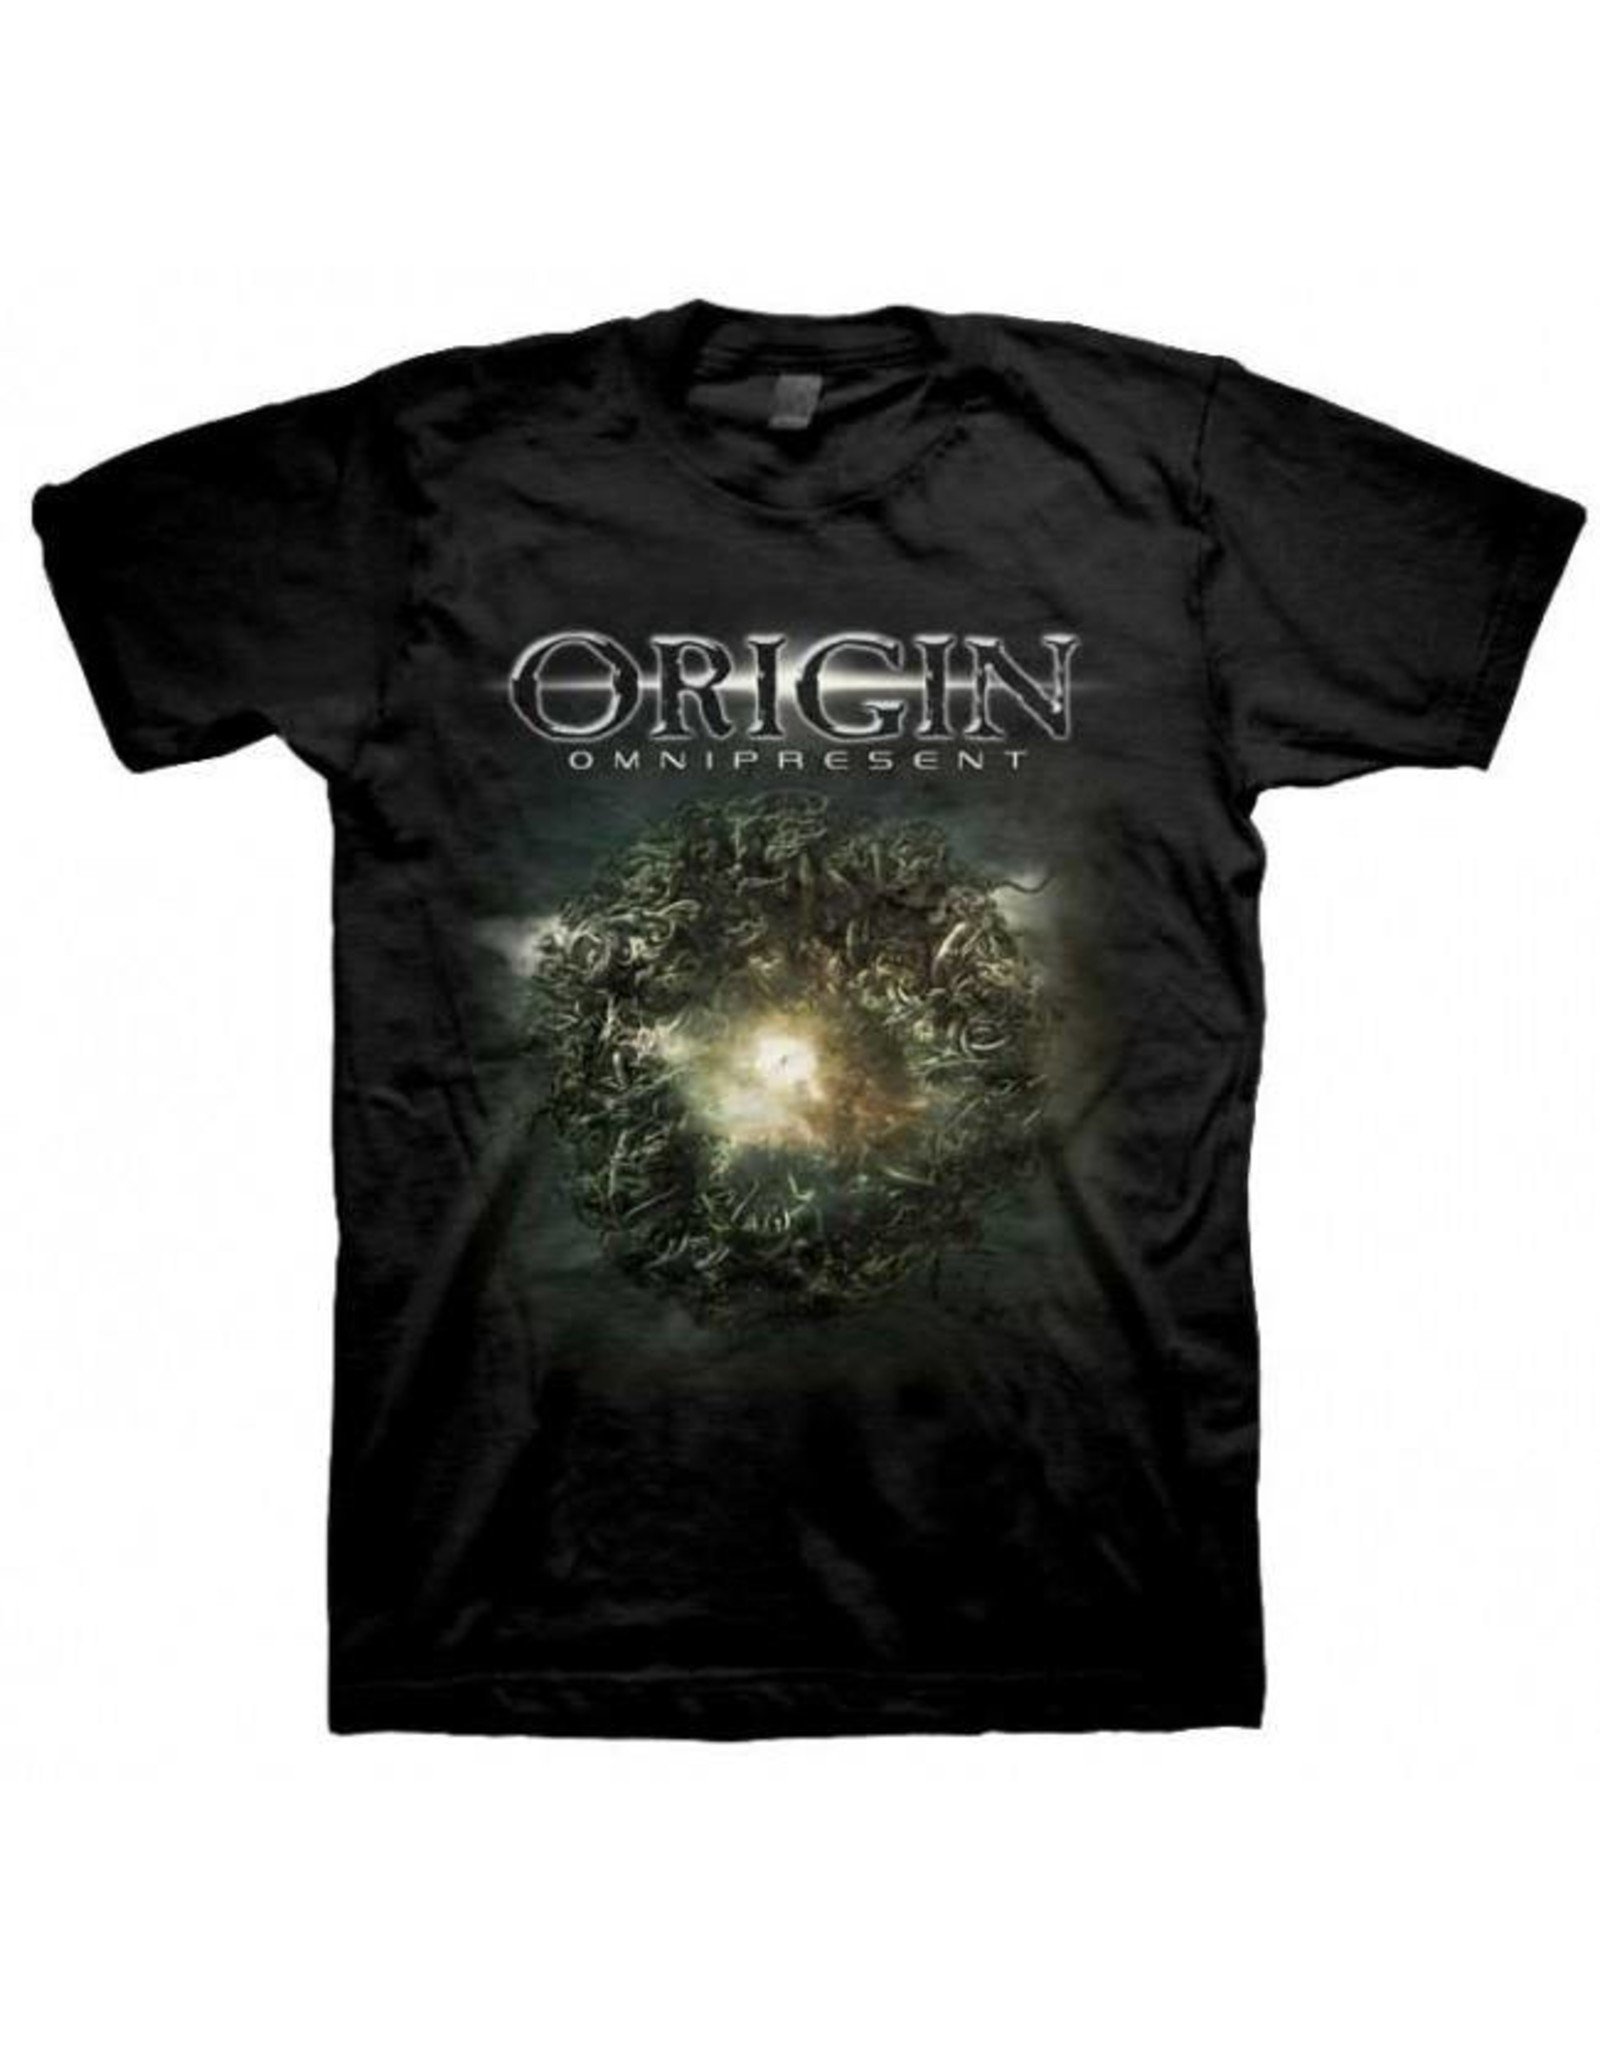 Origin Omnipresent Shirt